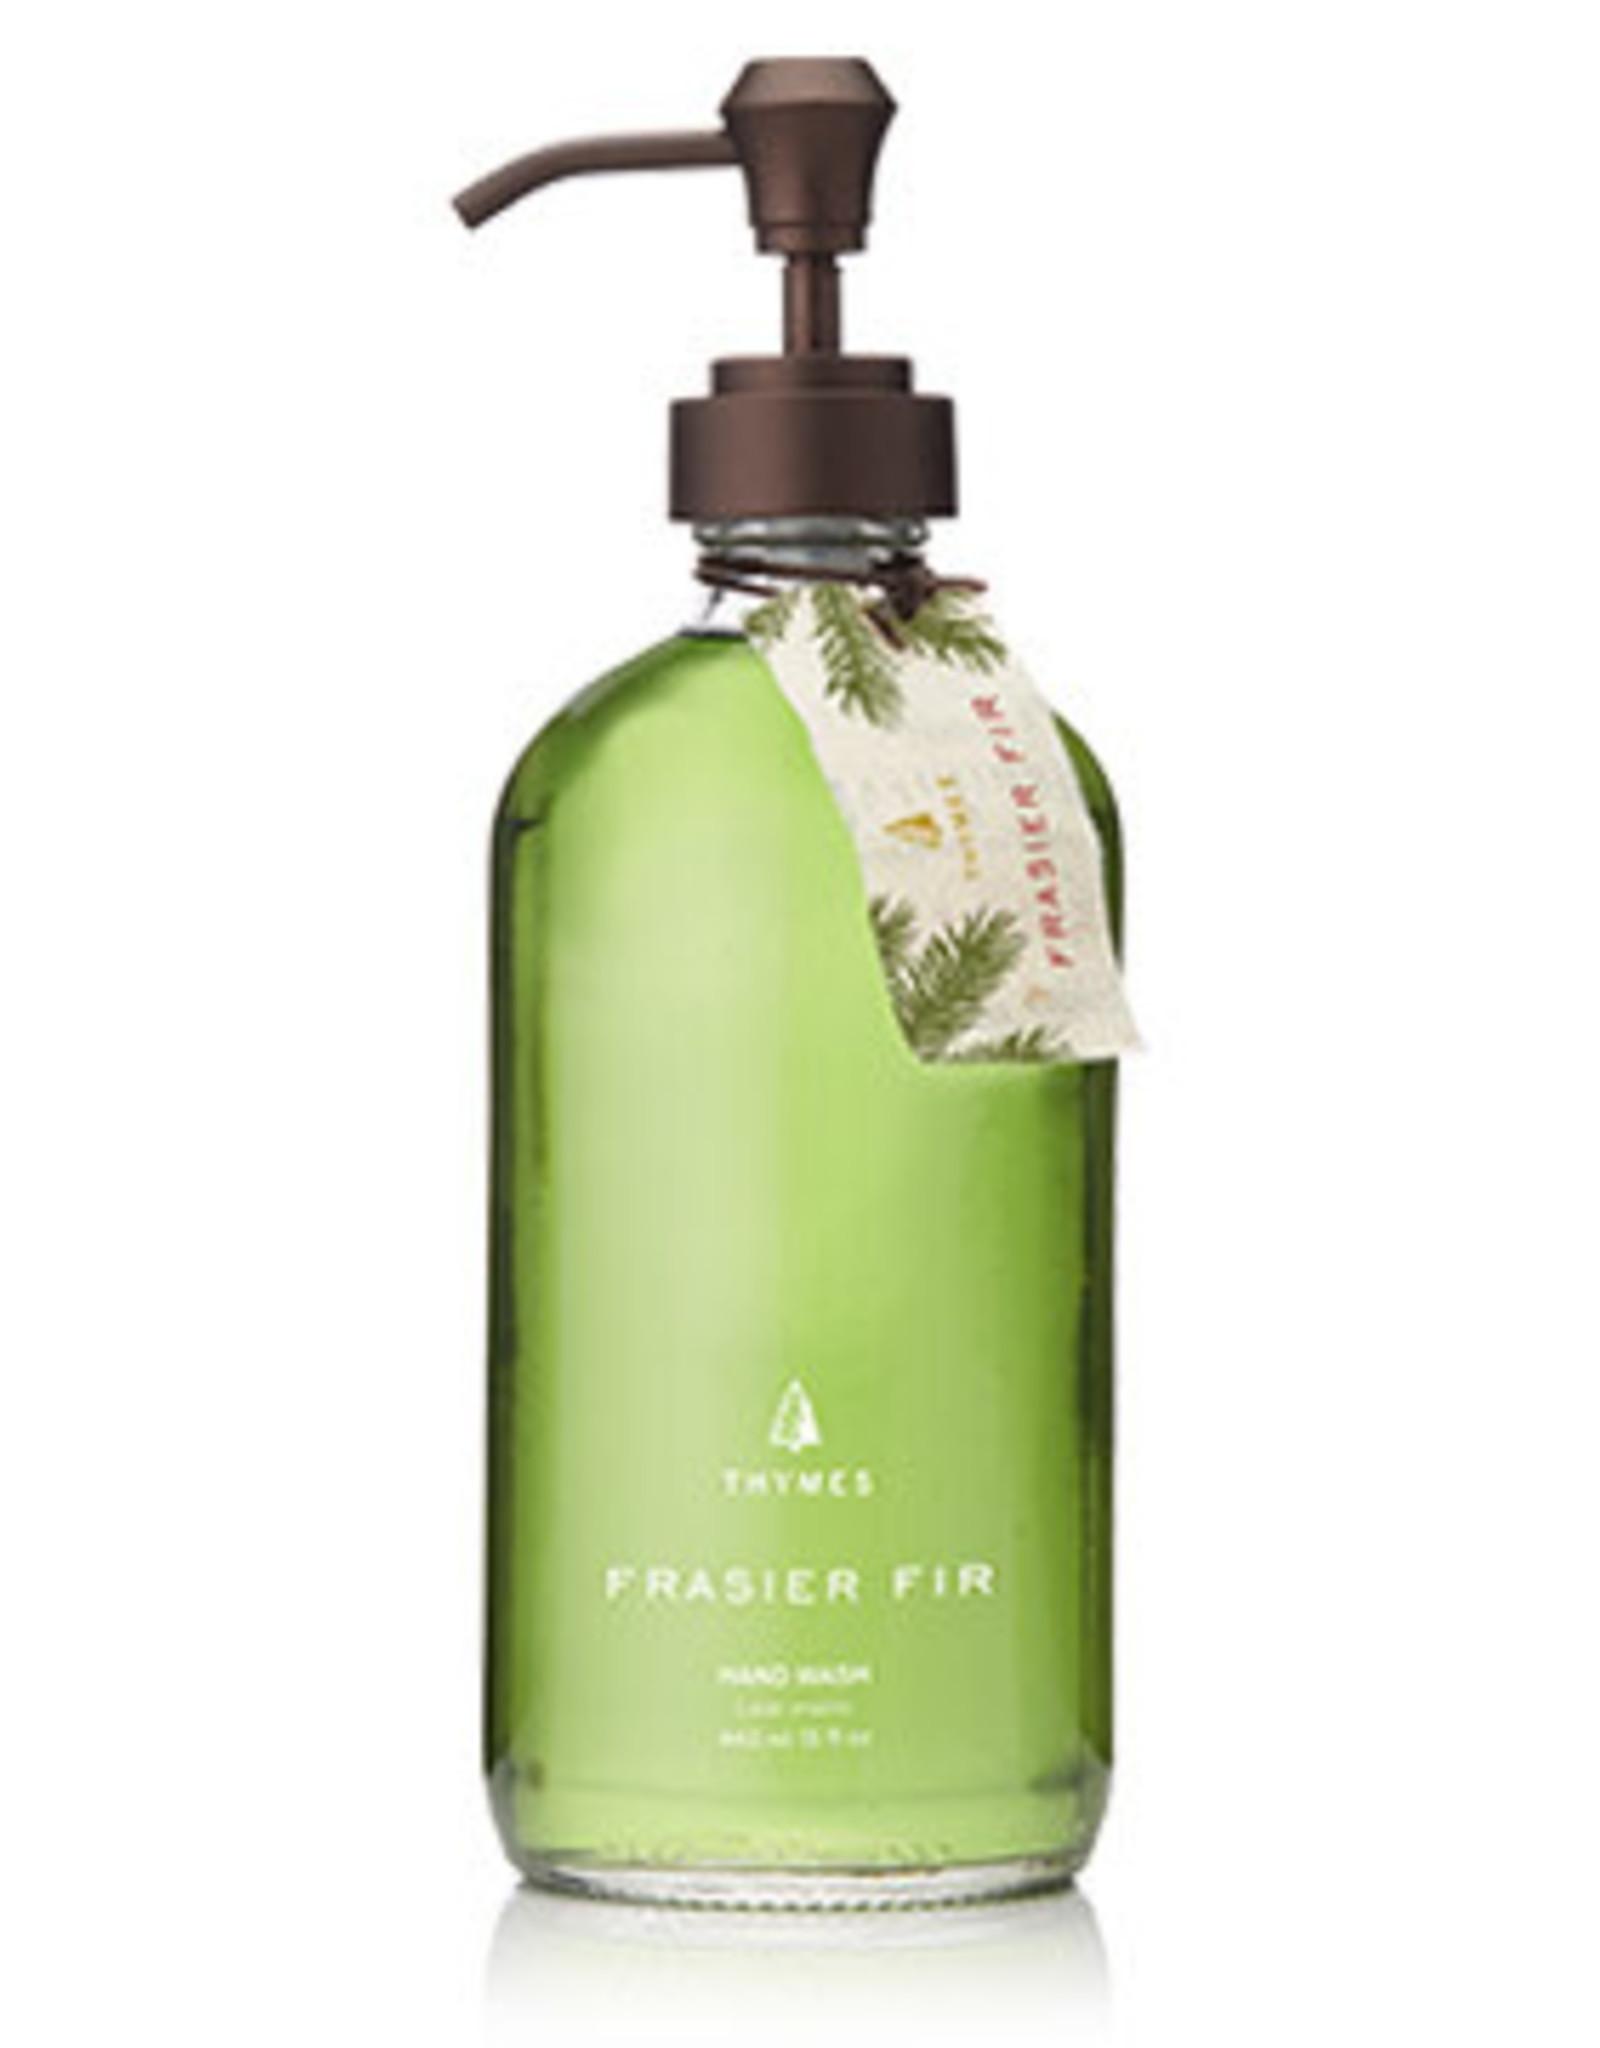 Thymes Frasier Fir Hand Wash - 15 oz. Glass Bottle